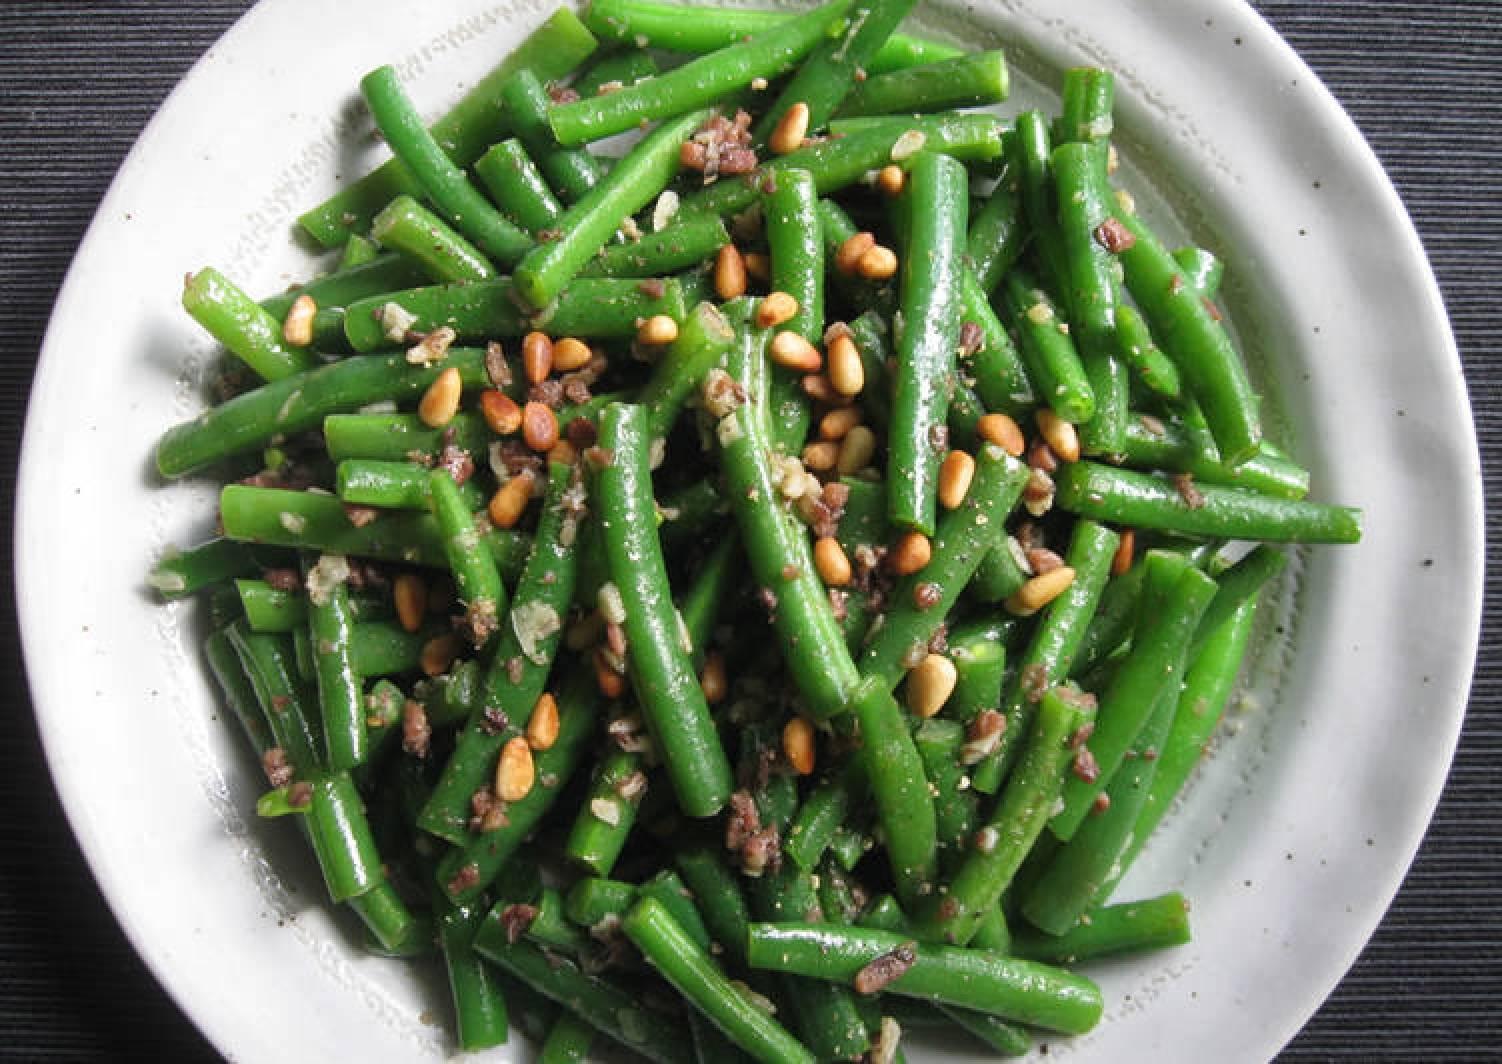 Anchovy Garlic Sautéed Green Beans